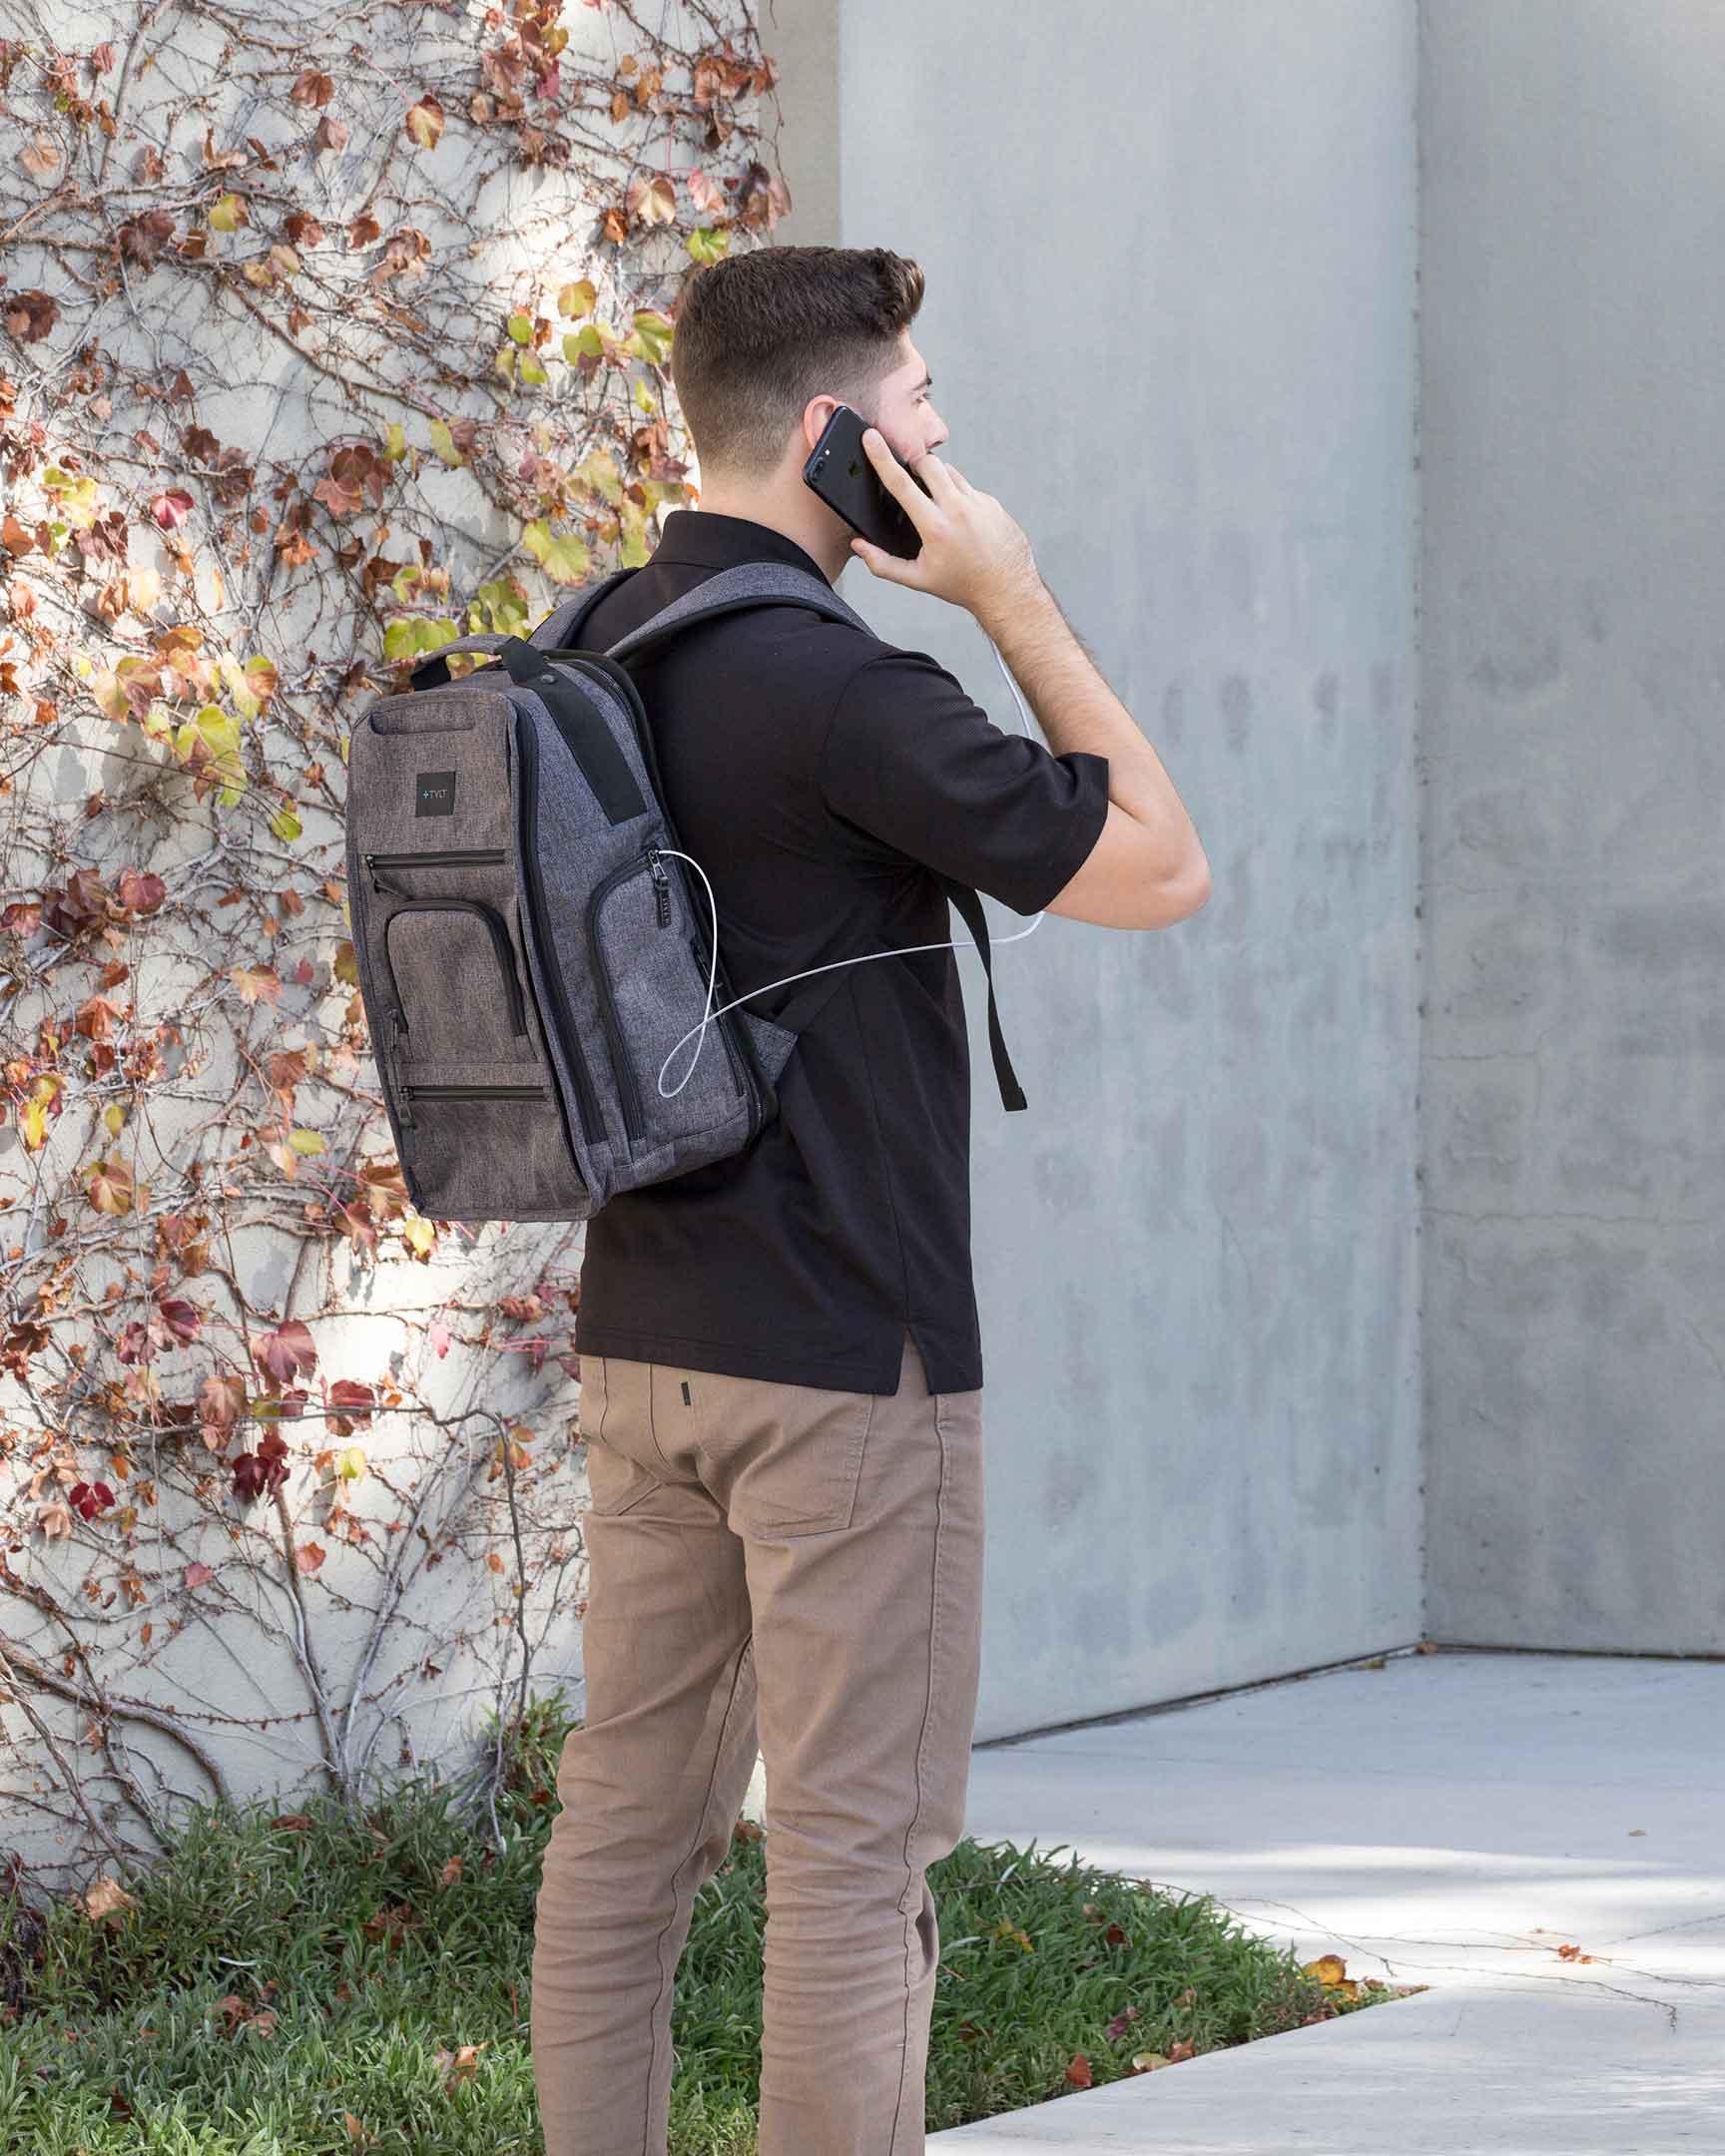 Tylt Traveler Power Bag charging phone